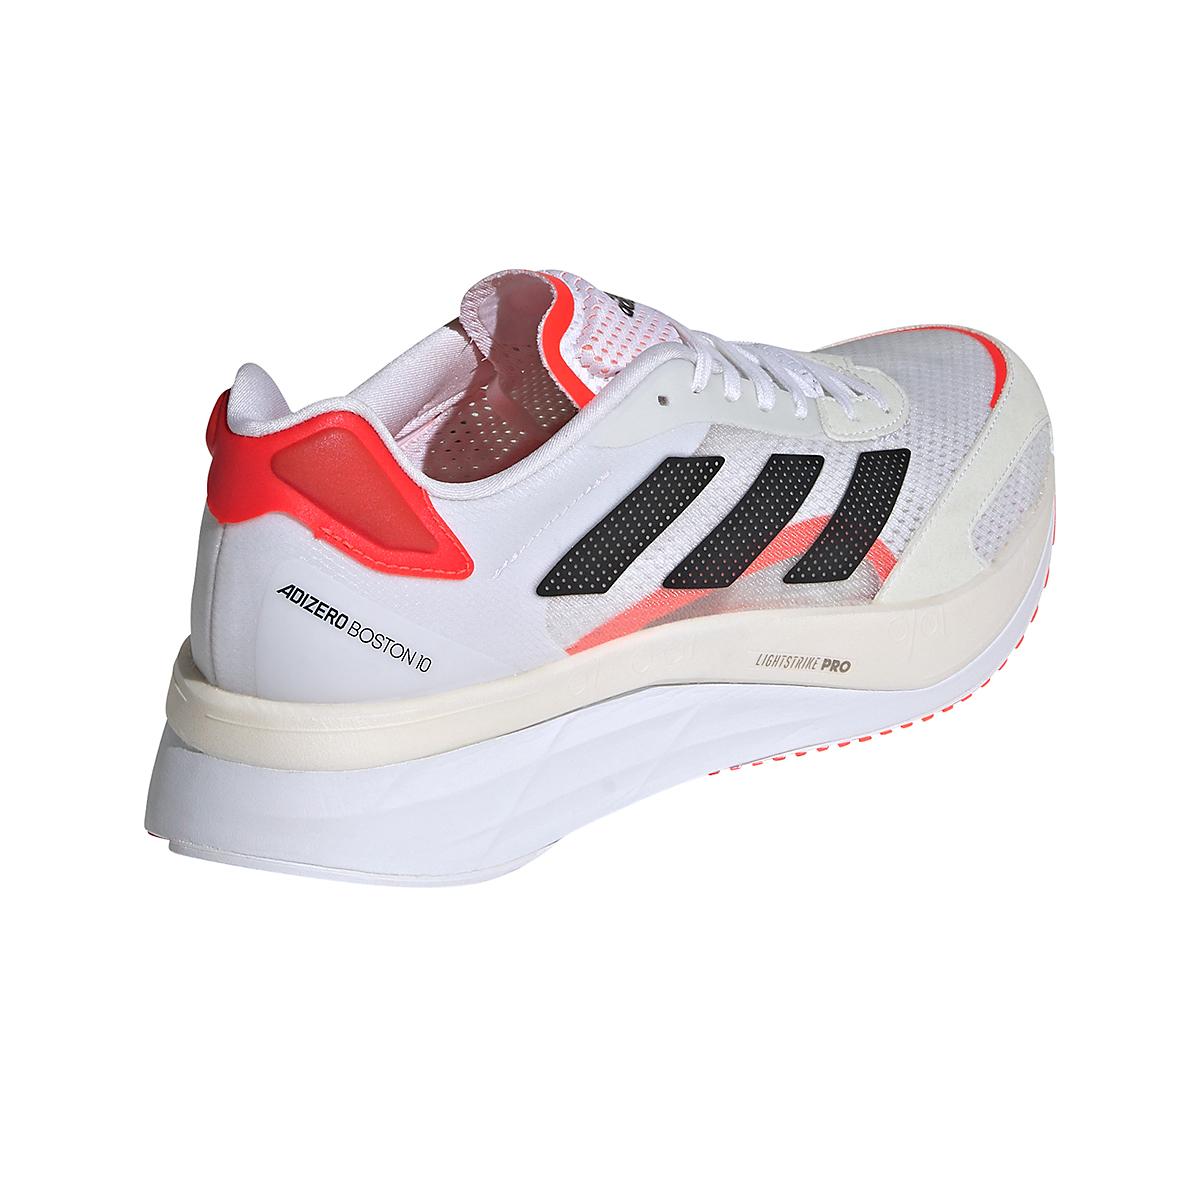 Men's Adidas Adizero Boston 10 Running Shoe - Color: Black/White/Solar Red - Size: 7 - Width: Regular, Black/White/Solar Red, large, image 4